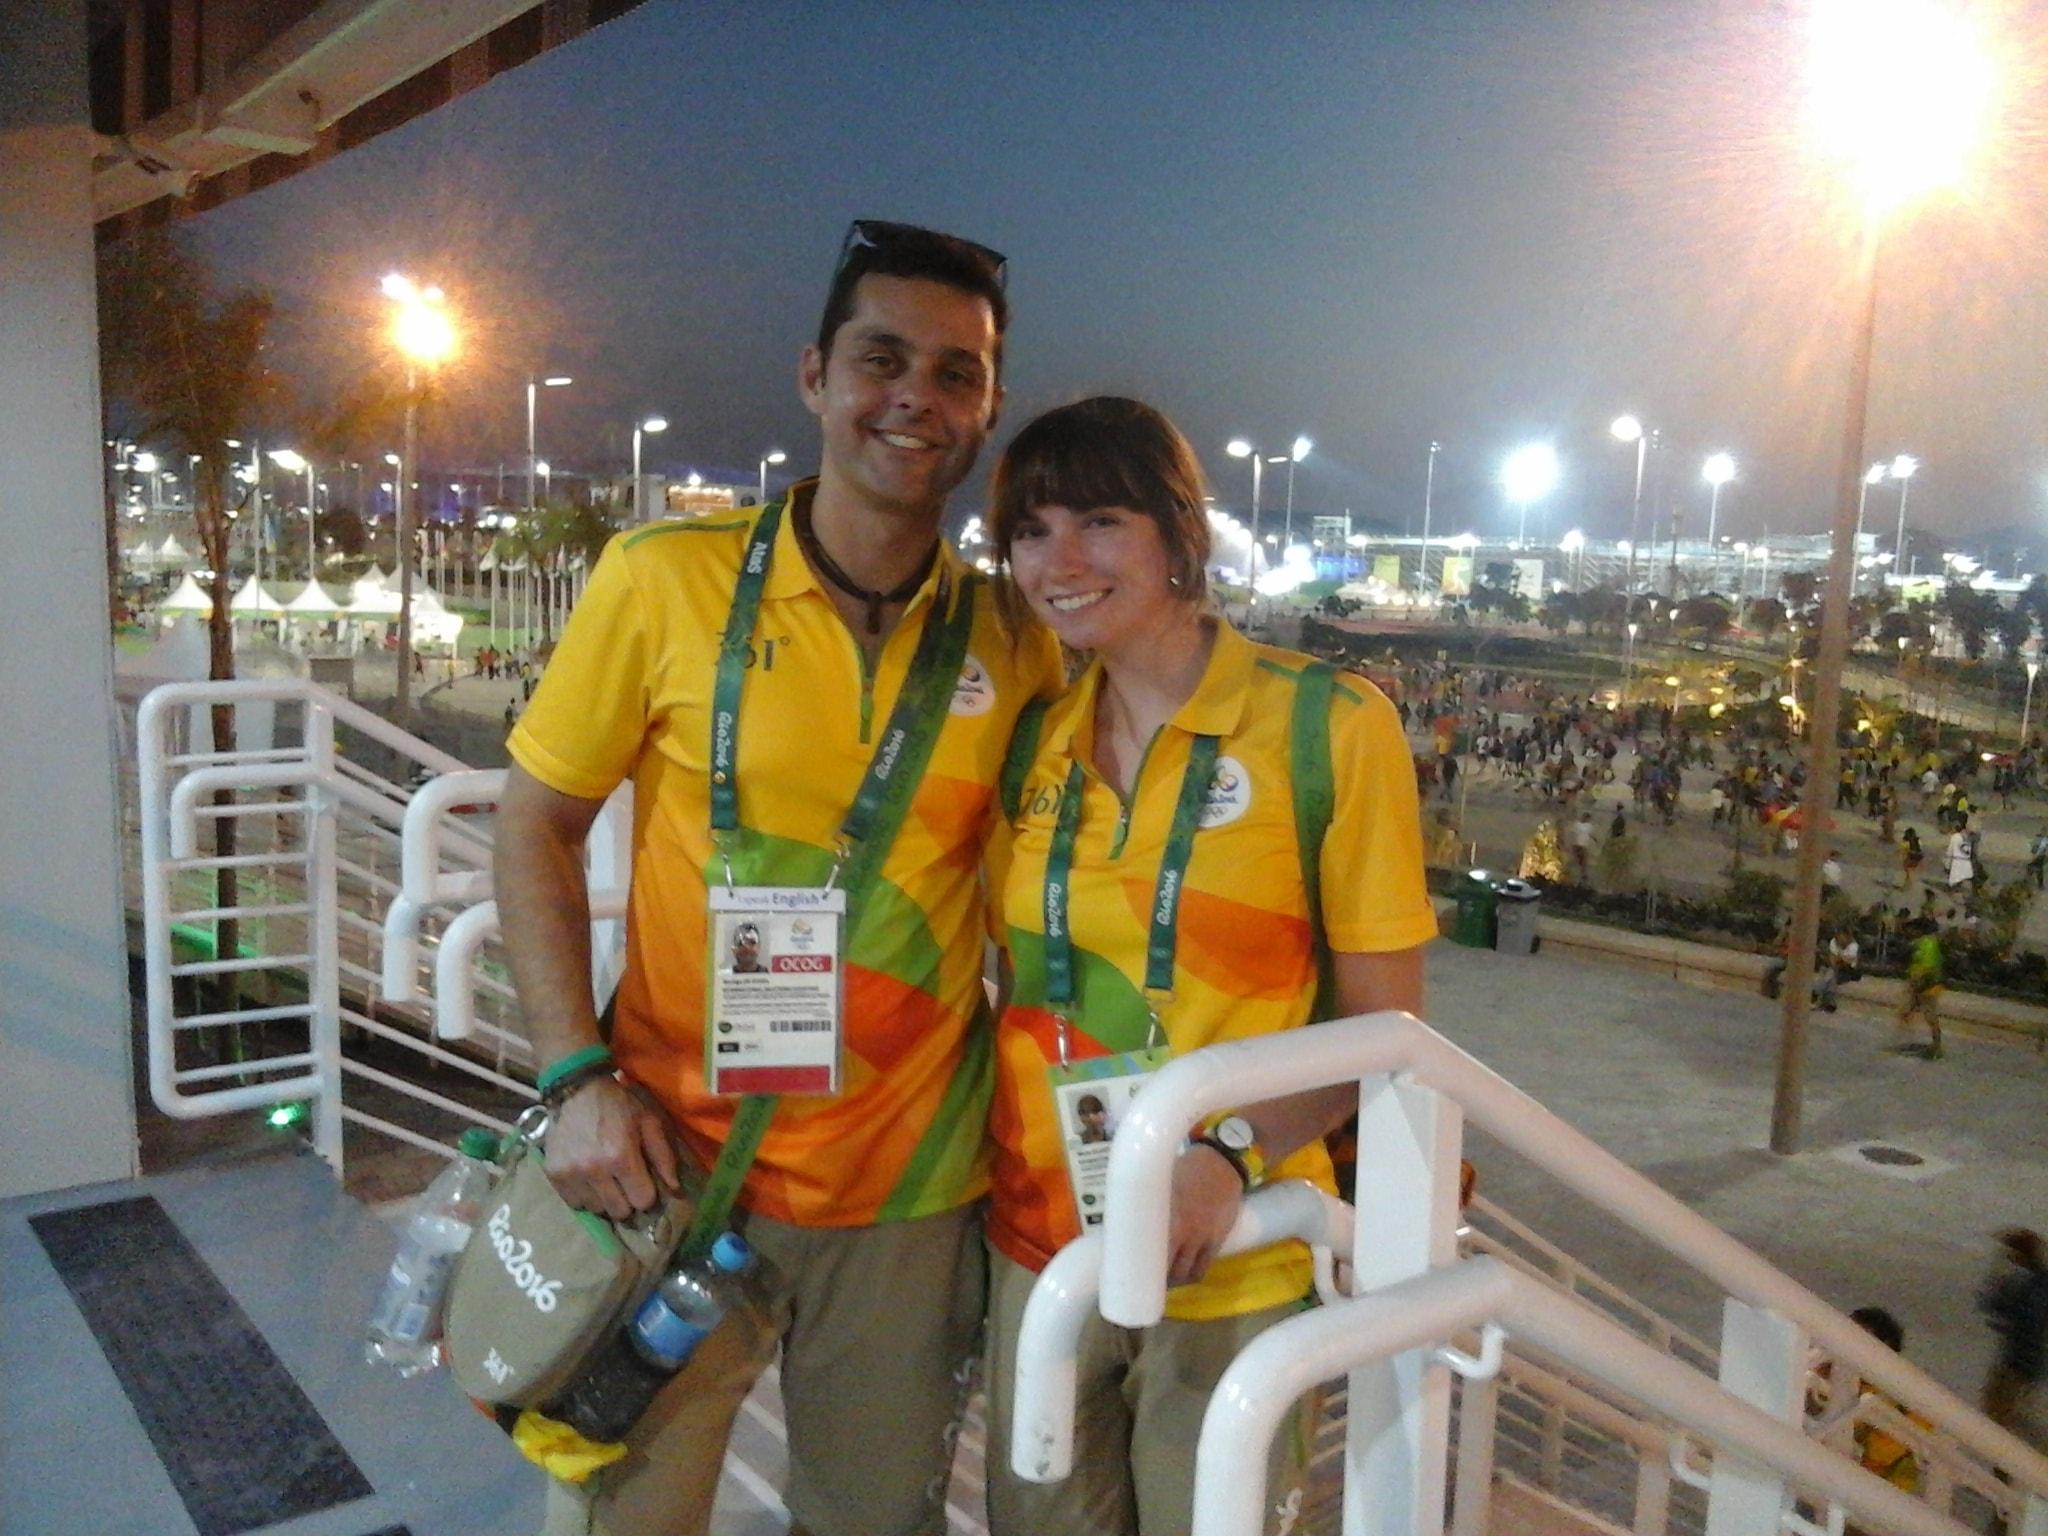 Rio 2016 Olympic Volunteer Uniform